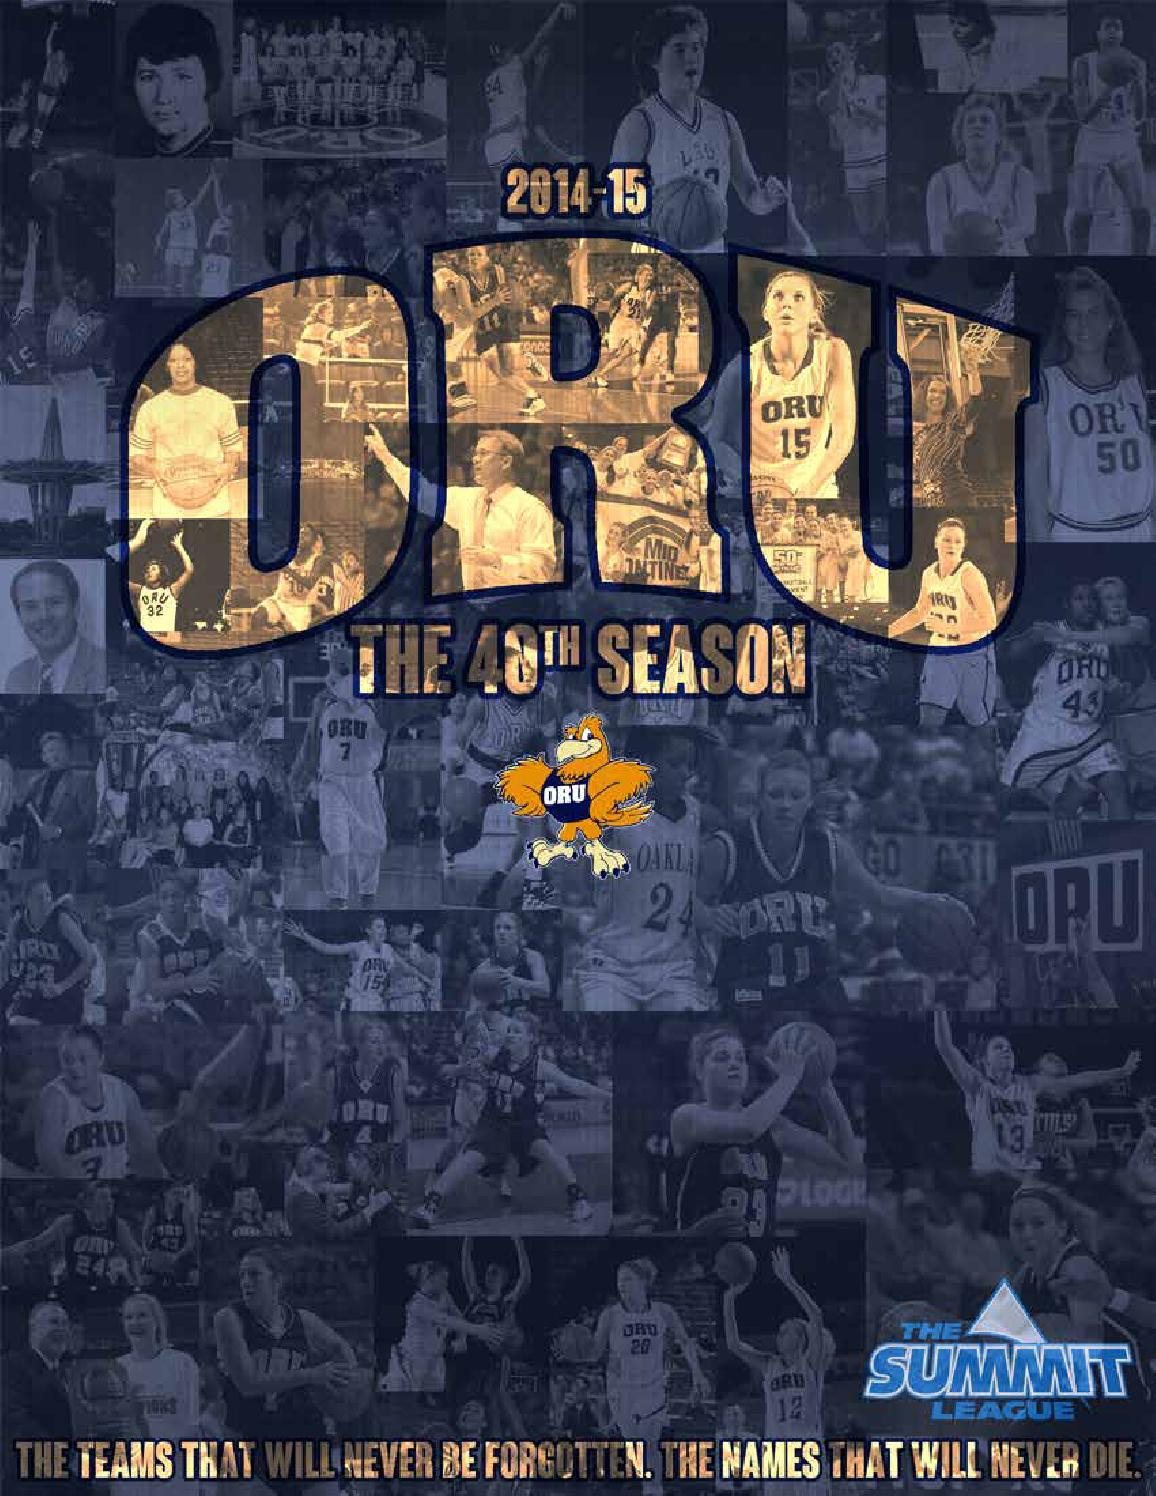 b180f1113e78d4 2014-15 ORU Women s Basketball Media Guide by ORU Athletics - issuu